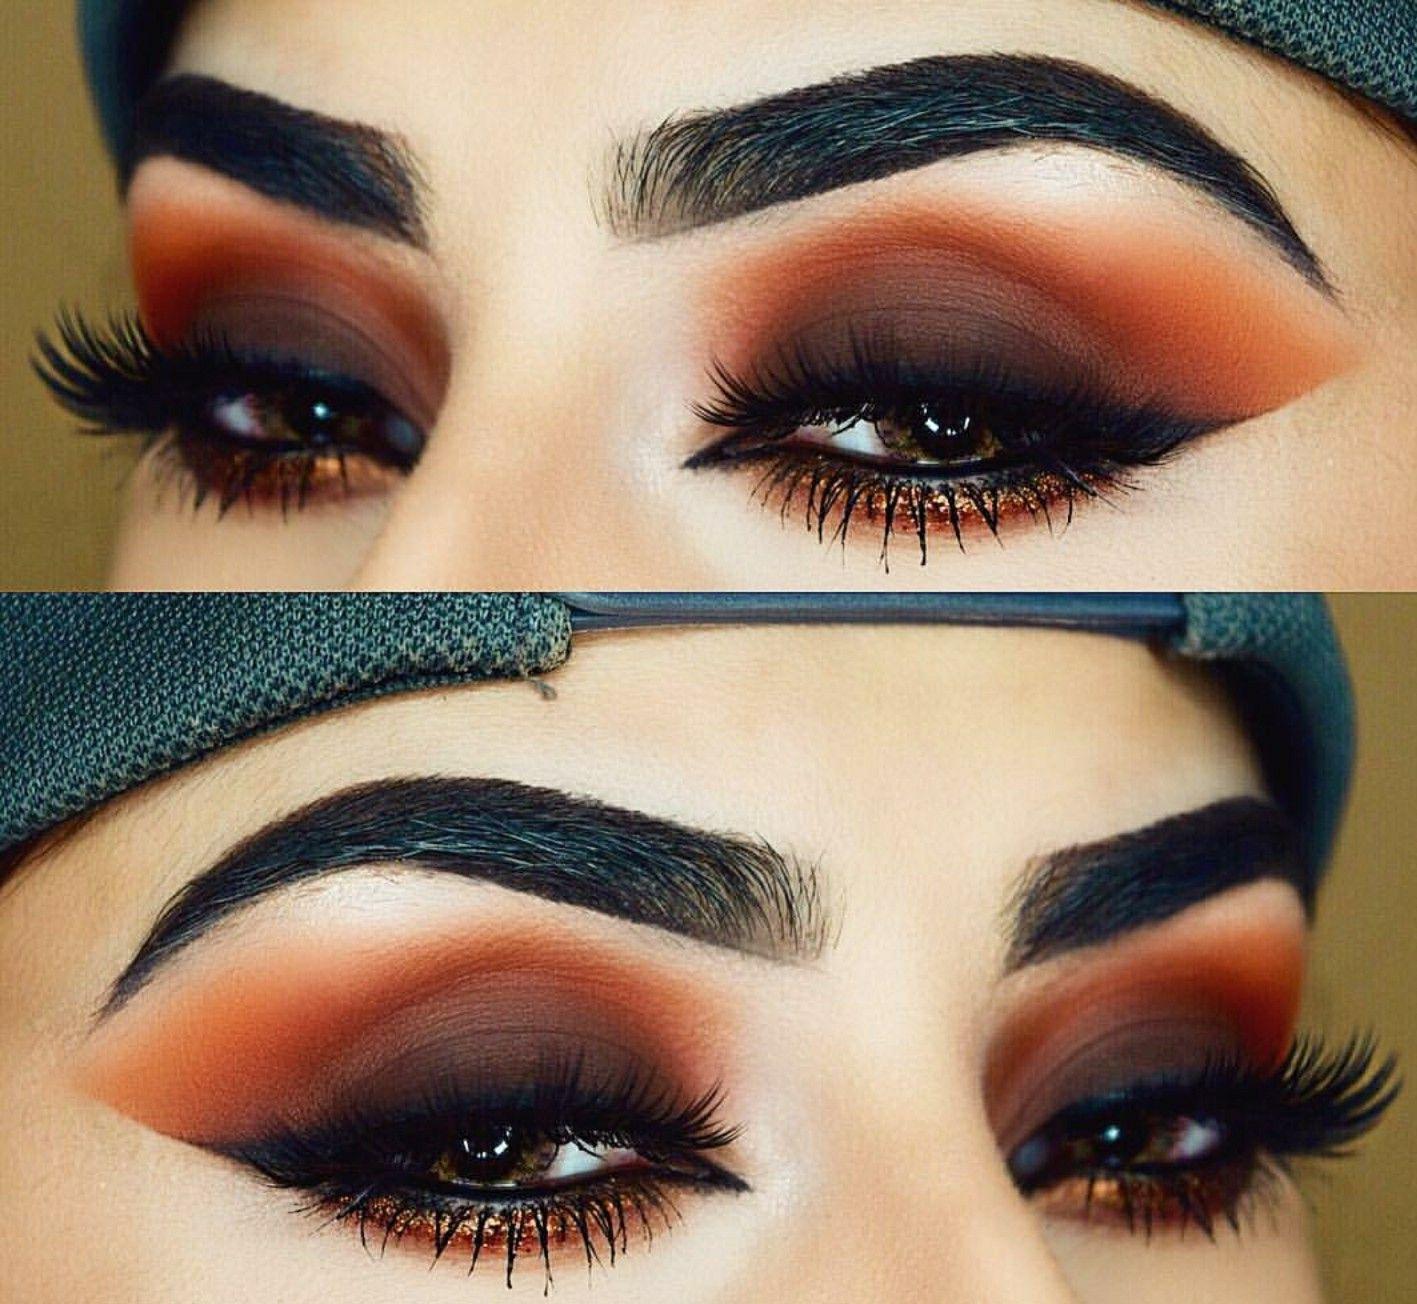 eyeshadow makeup book makeup eyeshadow james charles